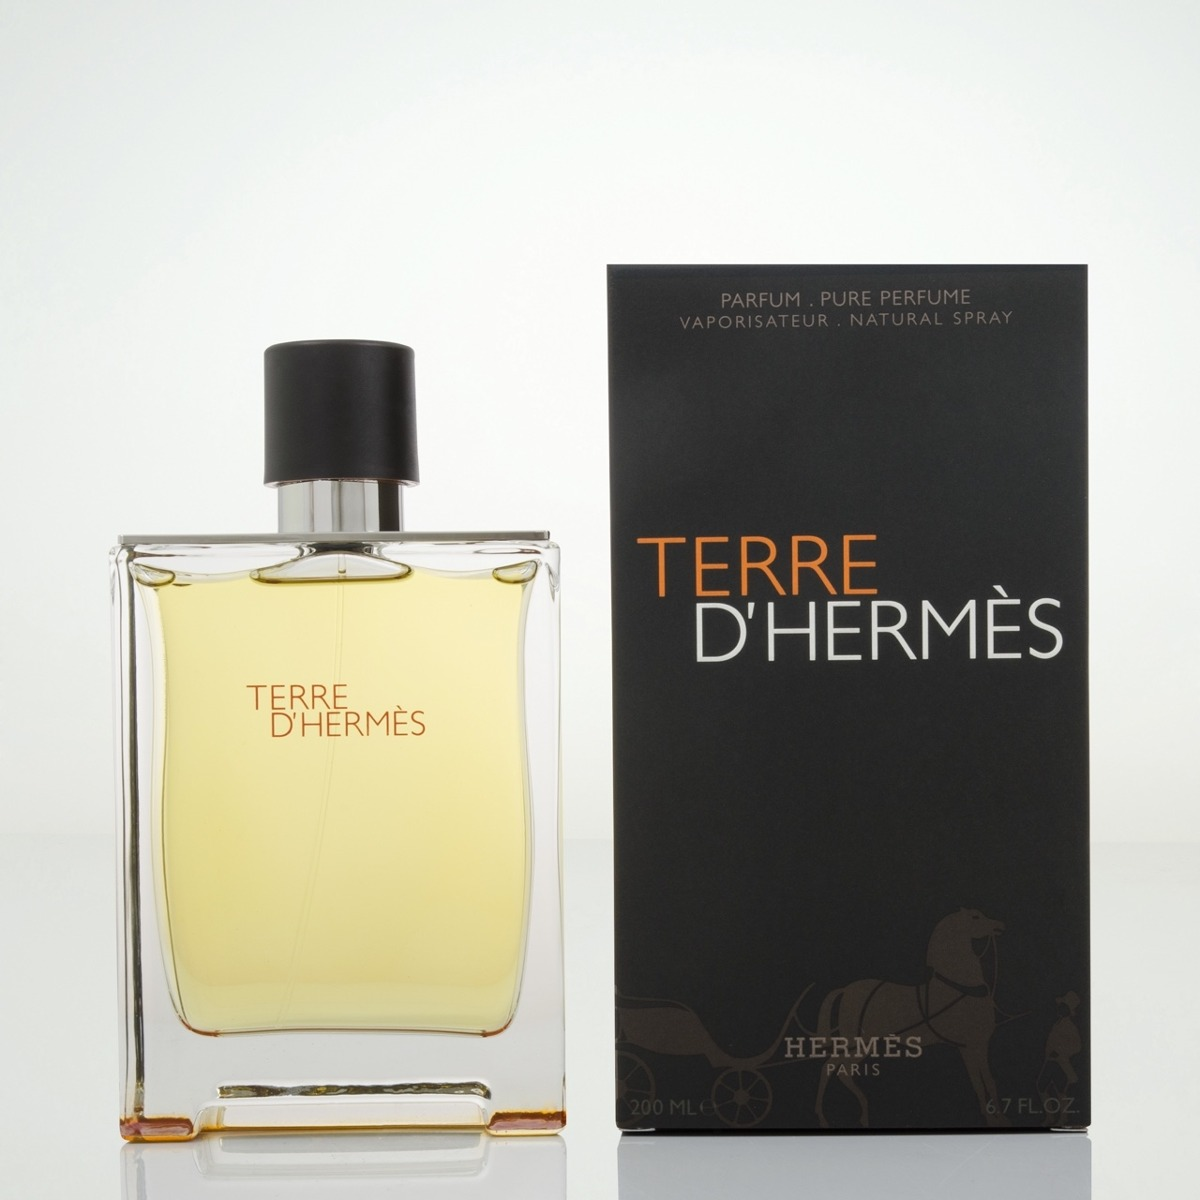 D'hermes Terre Hermes Único Pure Parfum 200ml Perfume eH2bDEIYW9